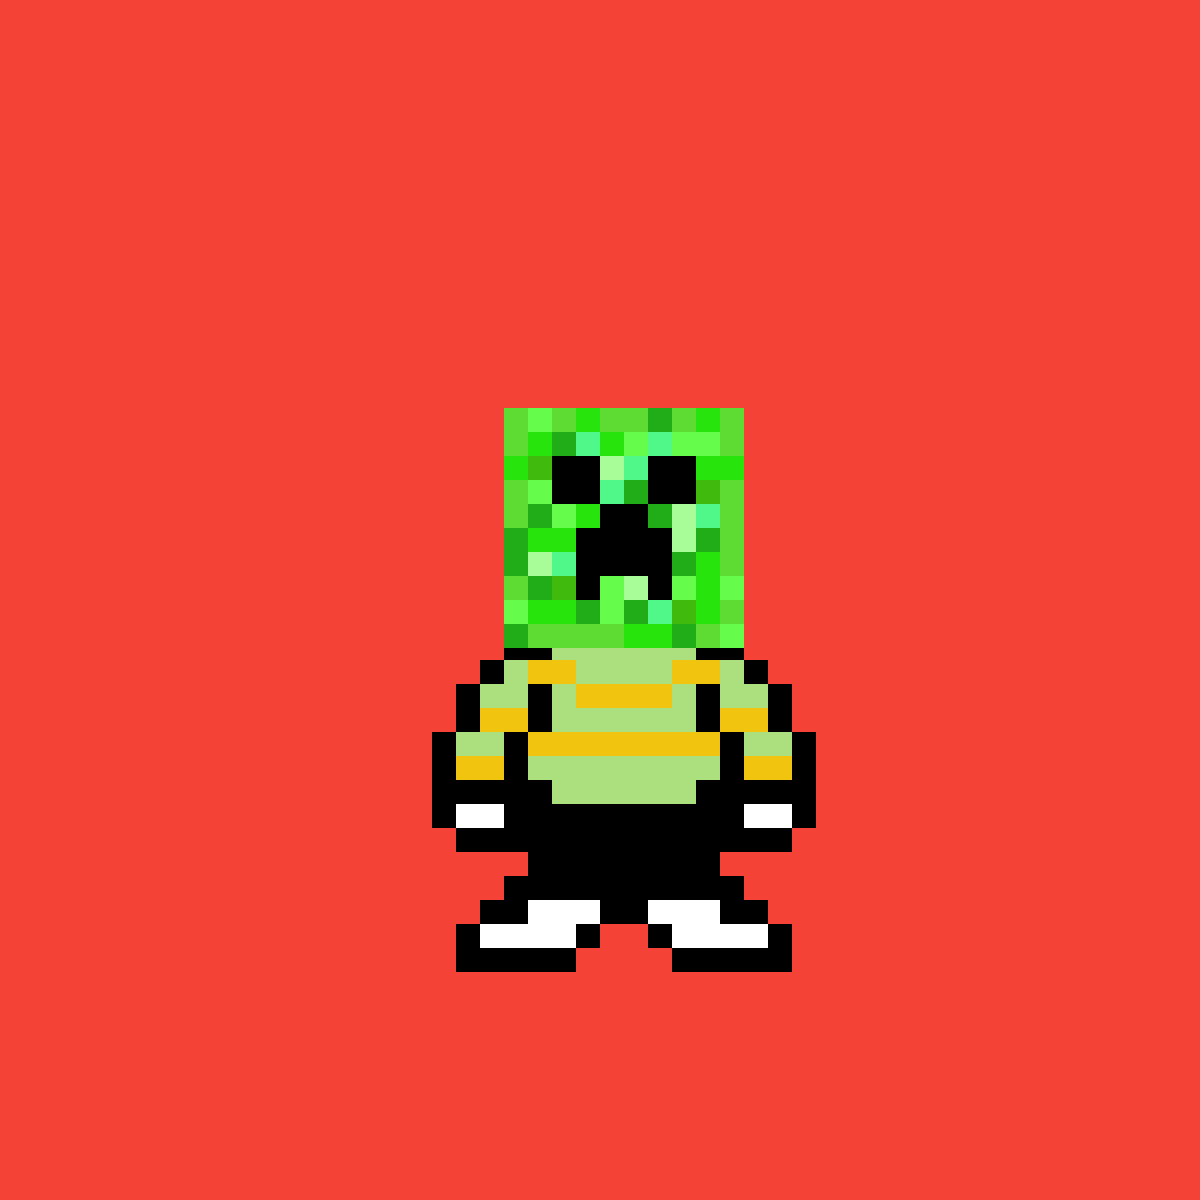 Asriel Creepurr by The-new-Joestar